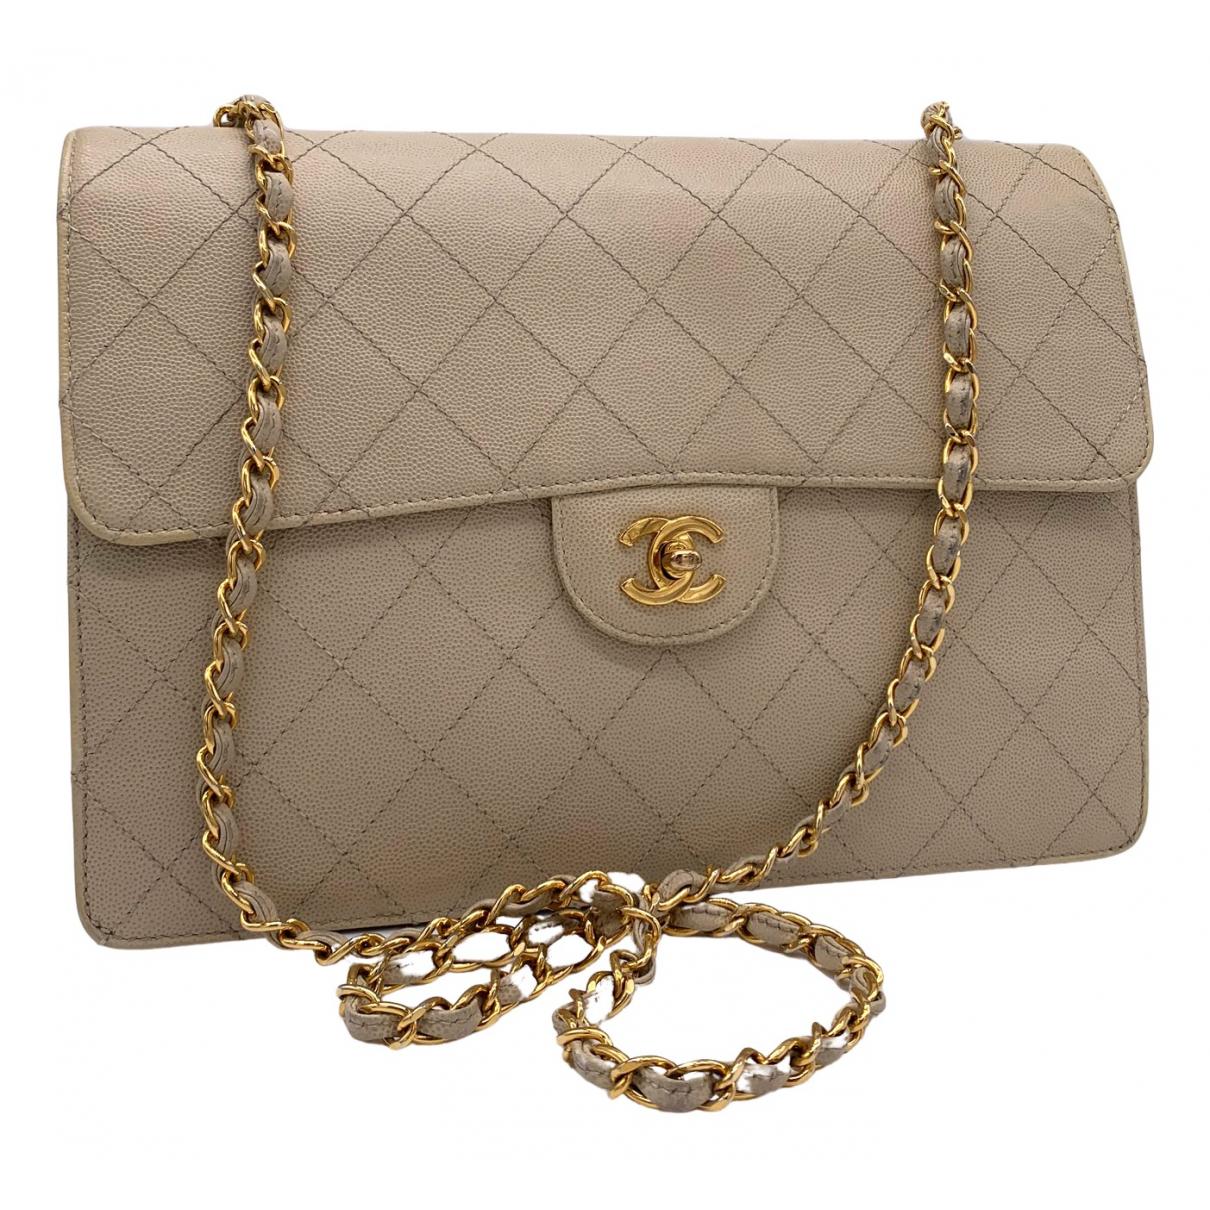 Chanel Timeless/Classique Beige Leather handbag for Women N